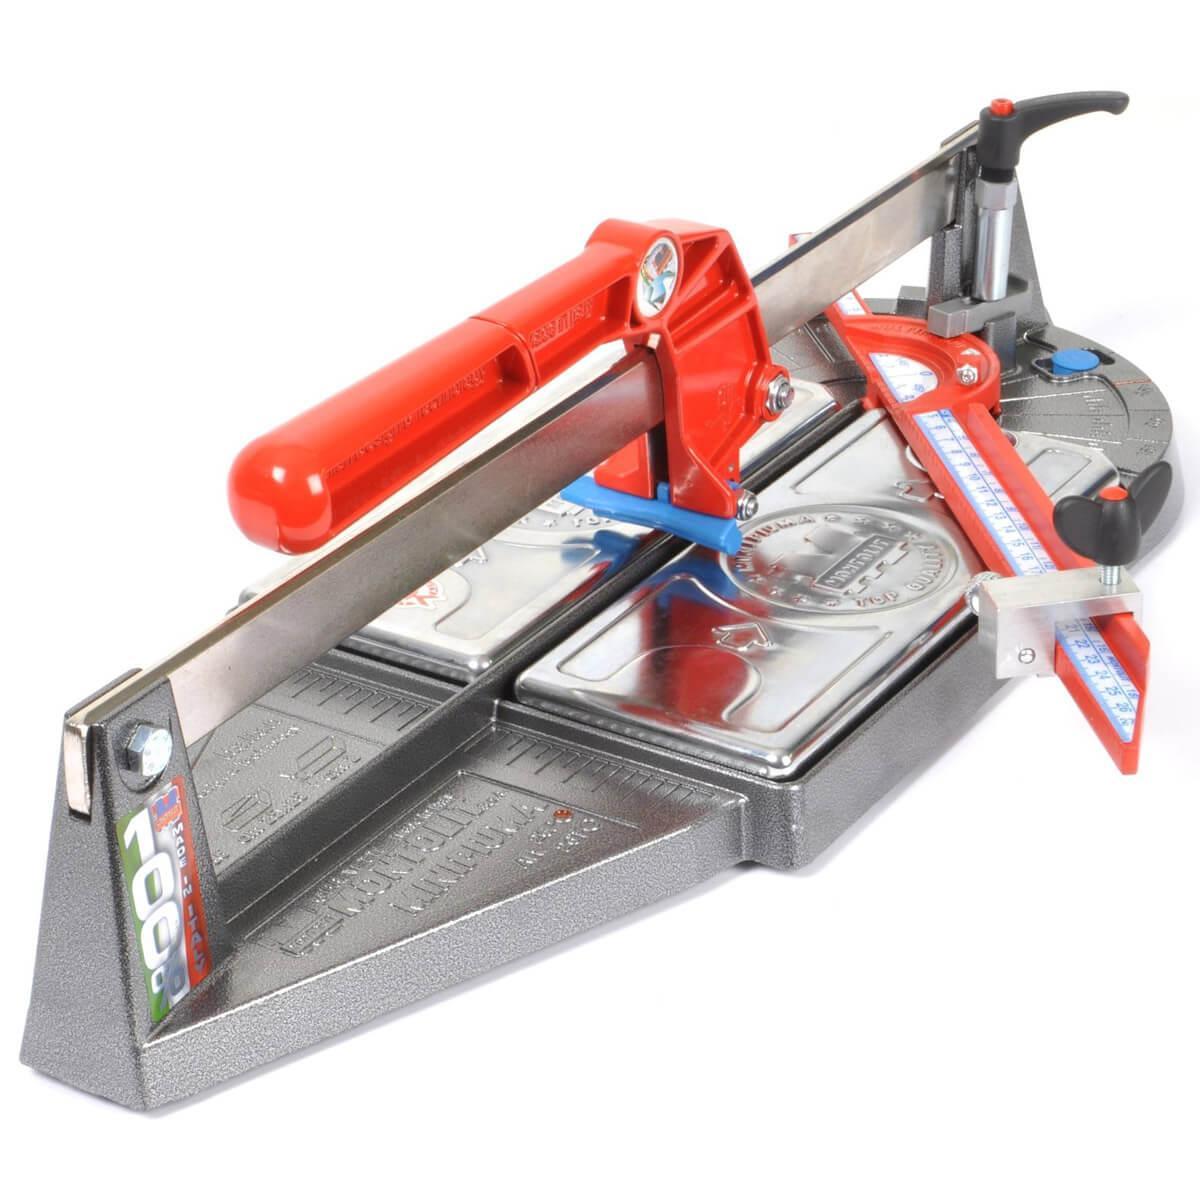 2456 montolit minipiuma tile cutters